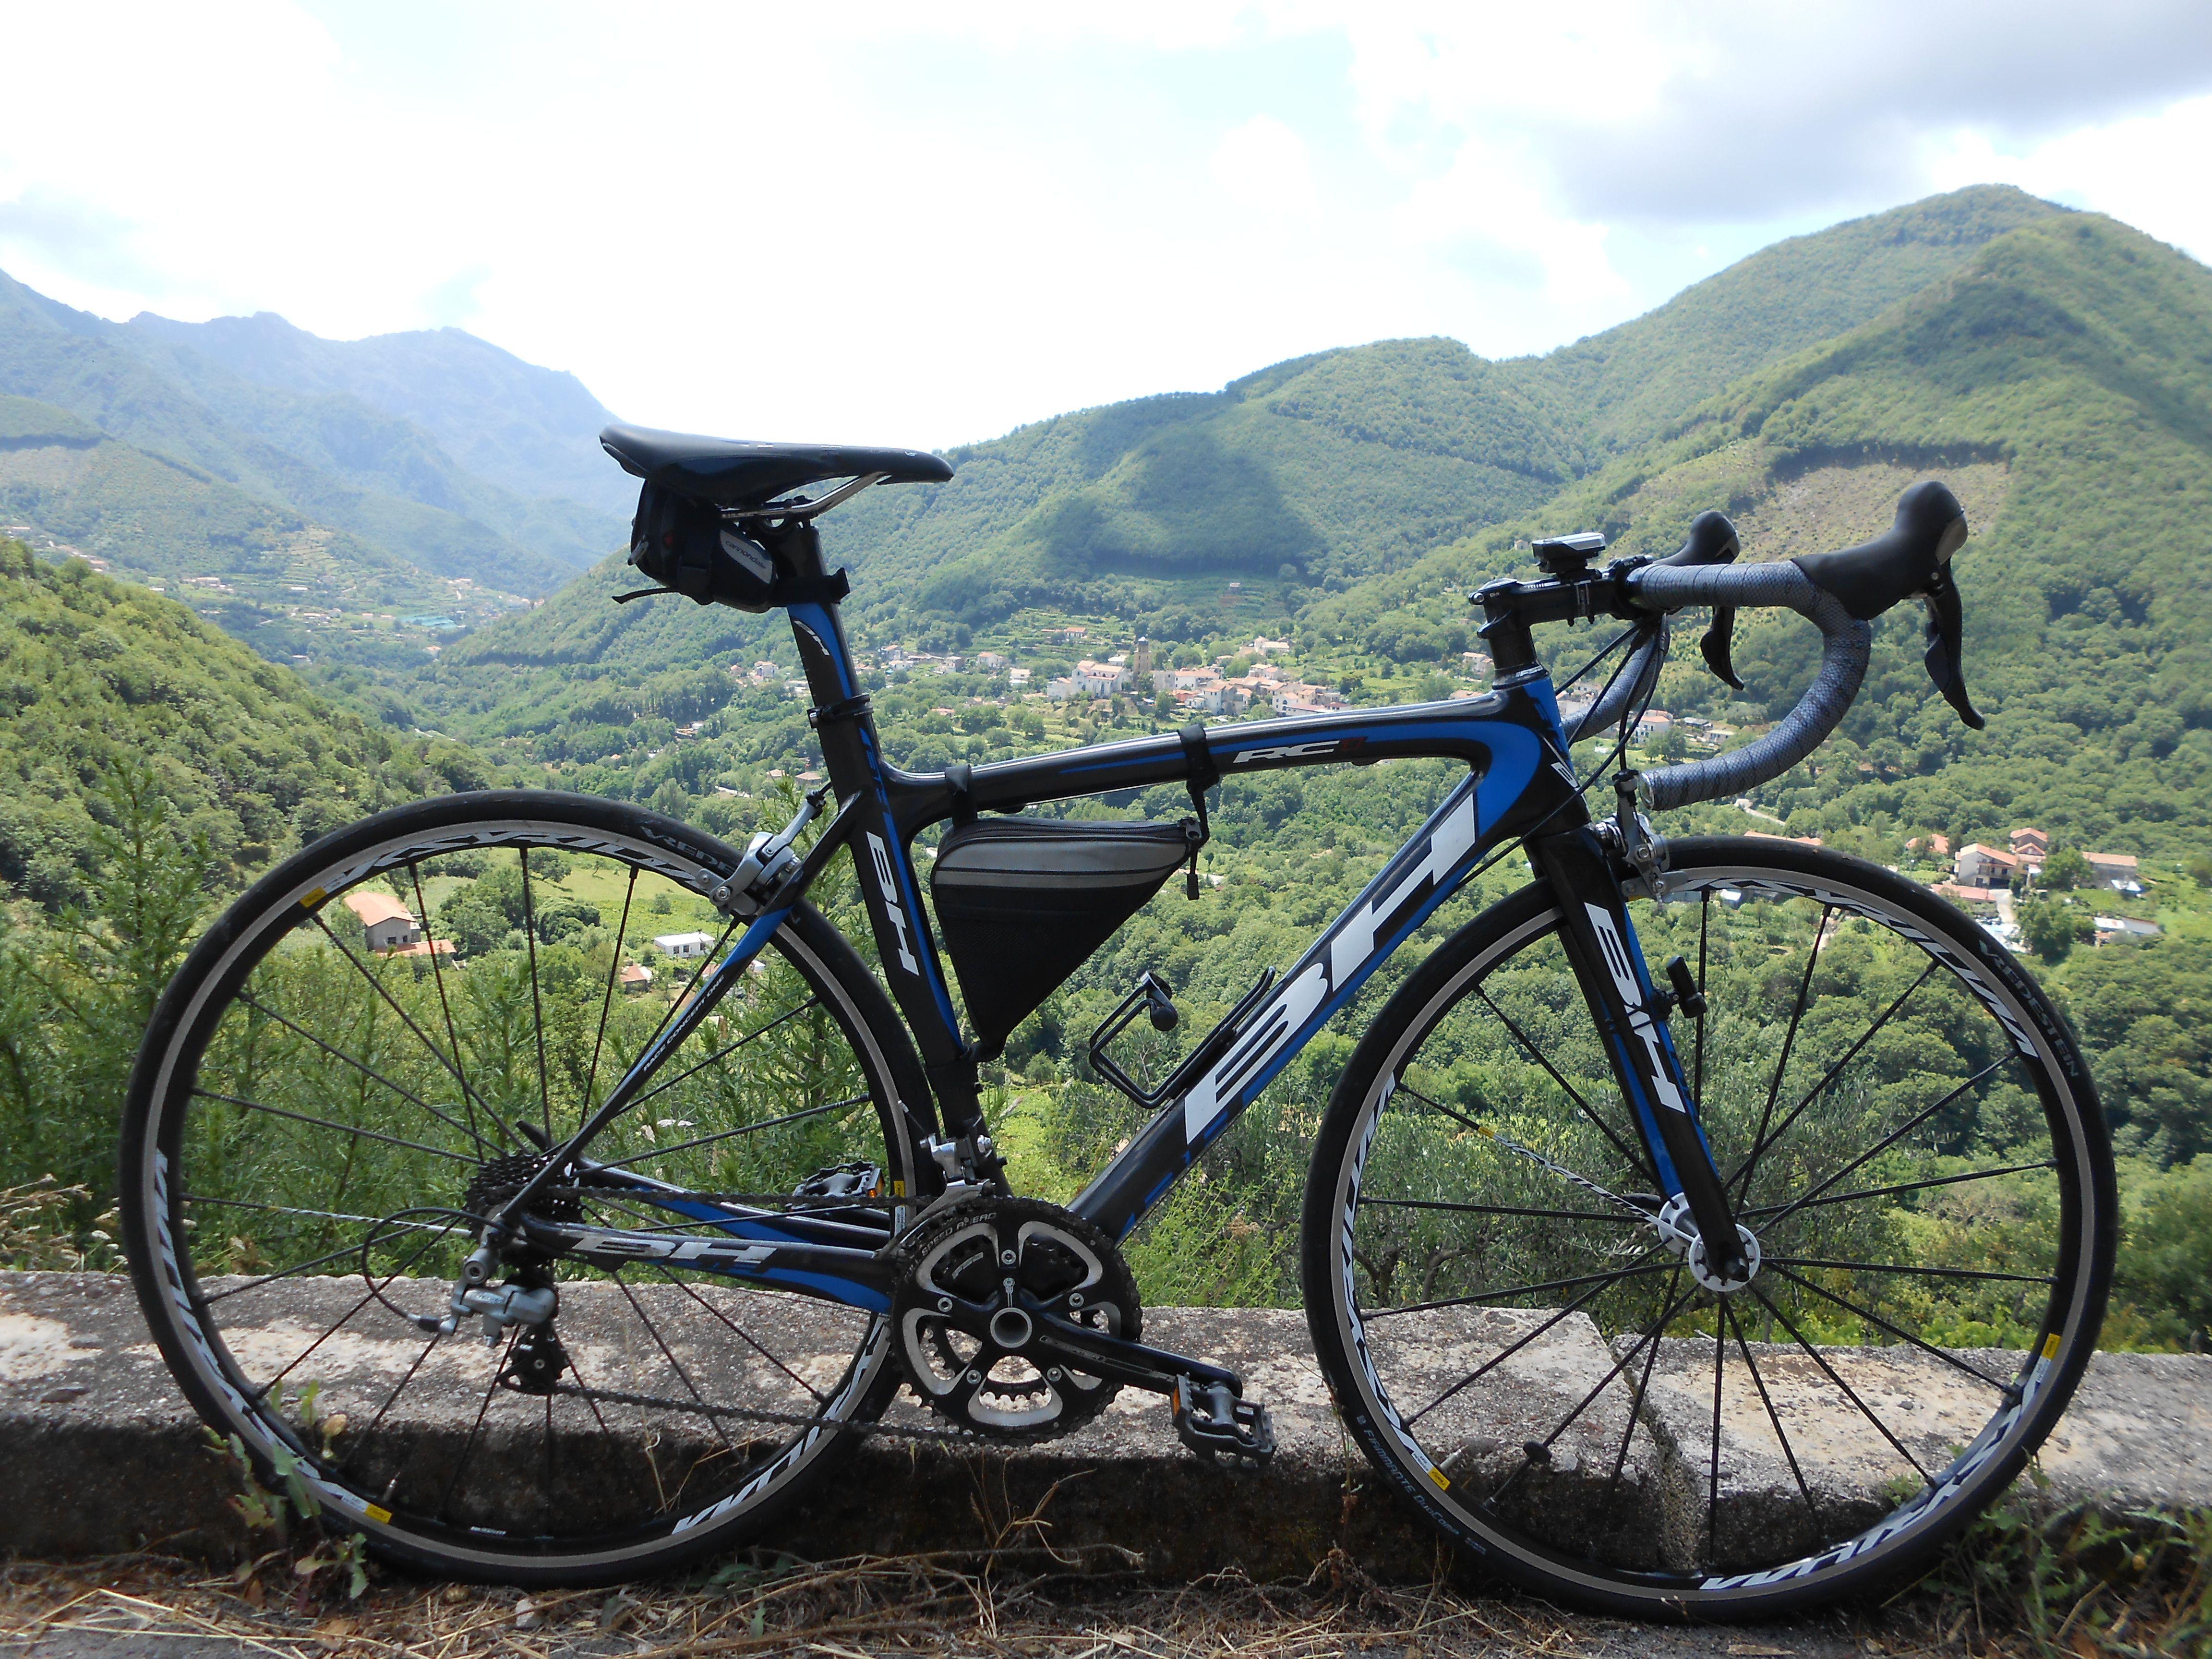 A Lightweight Bh Rc1 Carbon Fibre Road Bike Bike Race Training Racing Bikes Amalfi Coast Italy